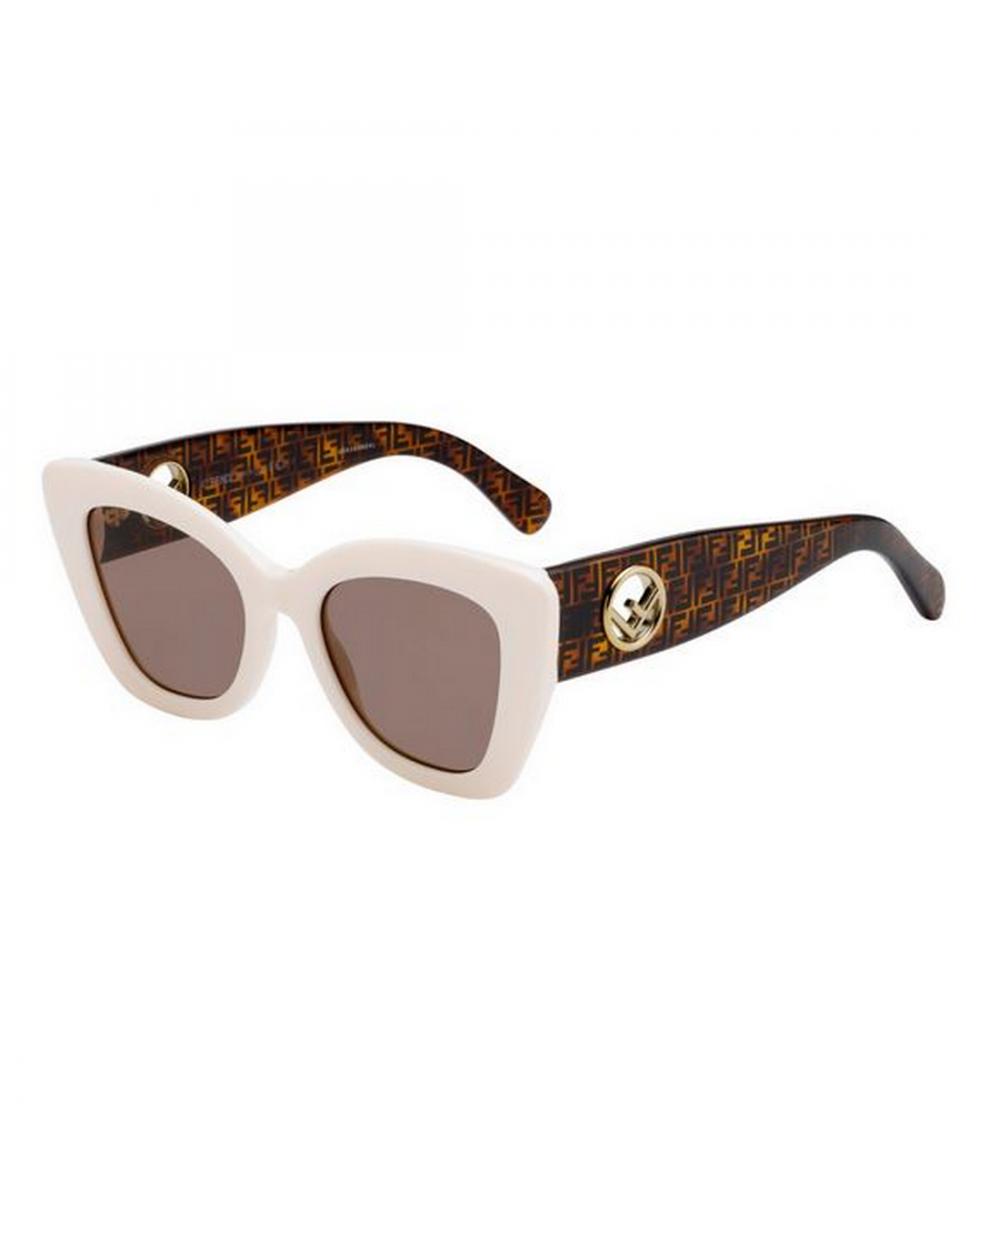 Sunglasses Fendi FF 0327/S original package warranty Italy